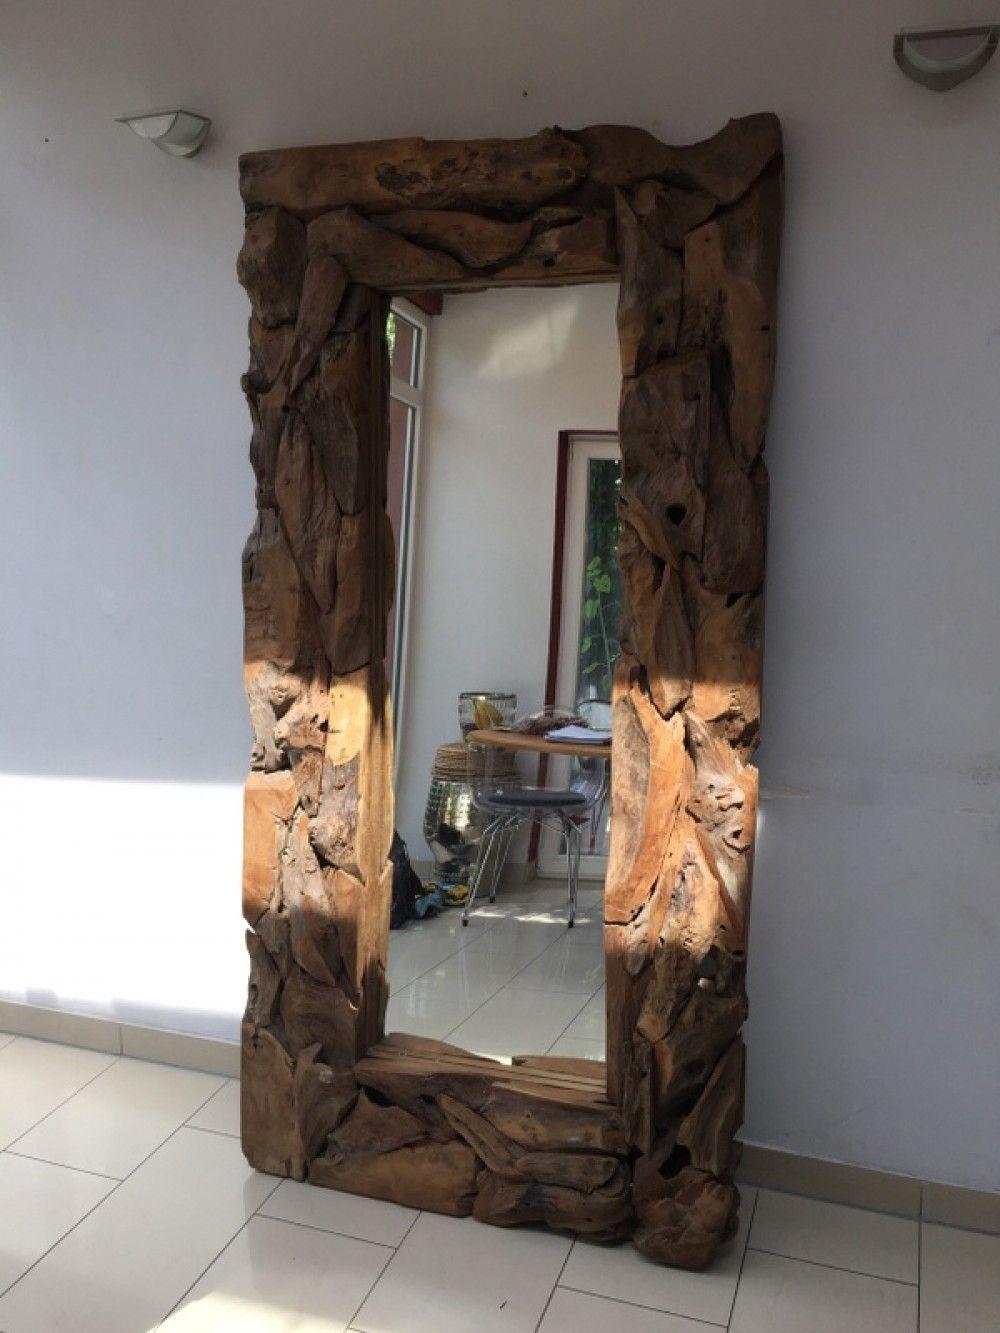 spiegel altholz rahmen wandspiegel ma e 200x100 cm spiegel wohnaccessoires spiegel. Black Bedroom Furniture Sets. Home Design Ideas